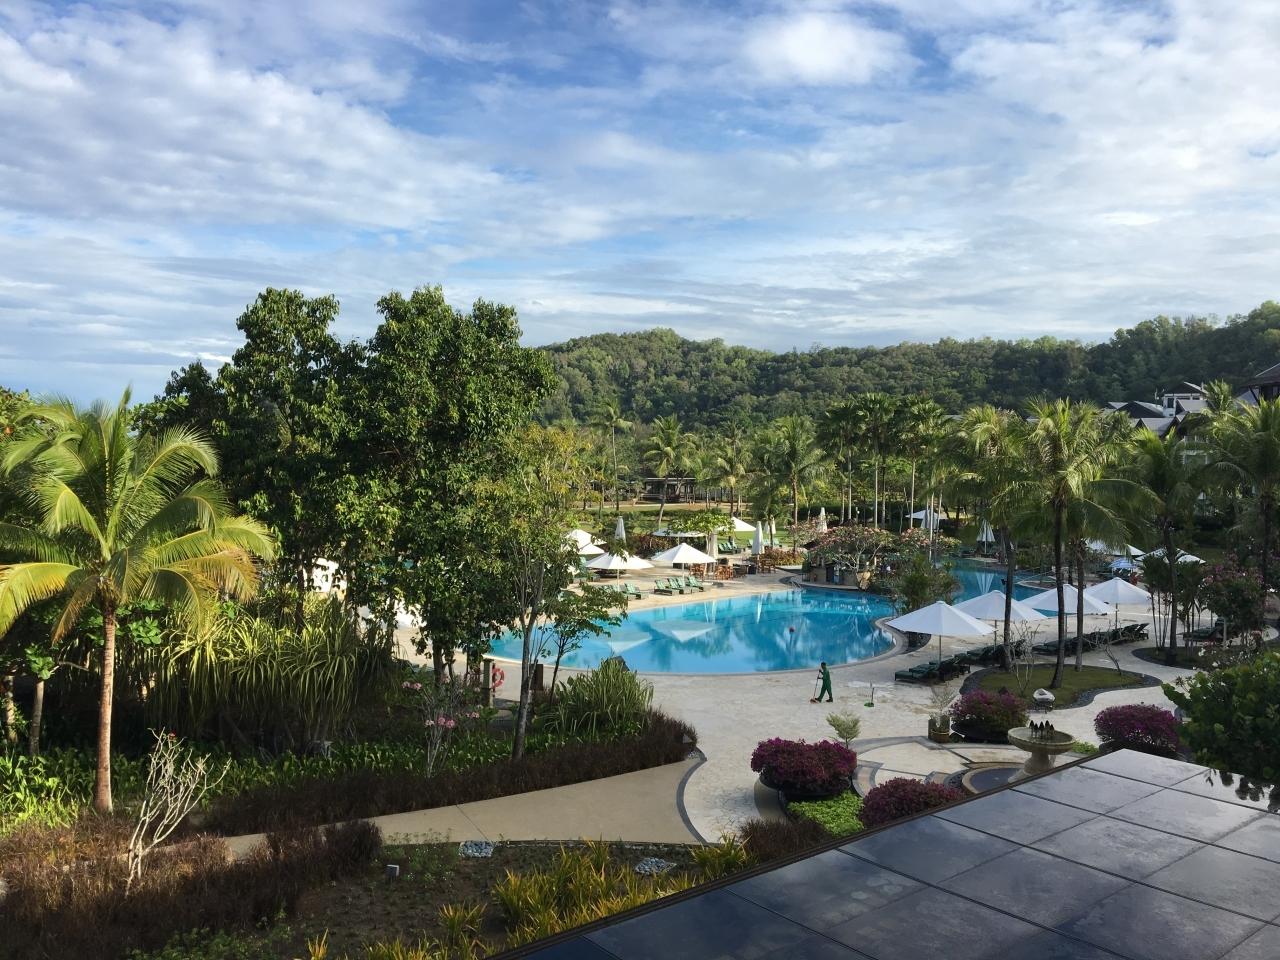 Shangri-La's Rasa Ria Resort, Kota Kinabalu シャングリ・ラ ラサリア リゾート